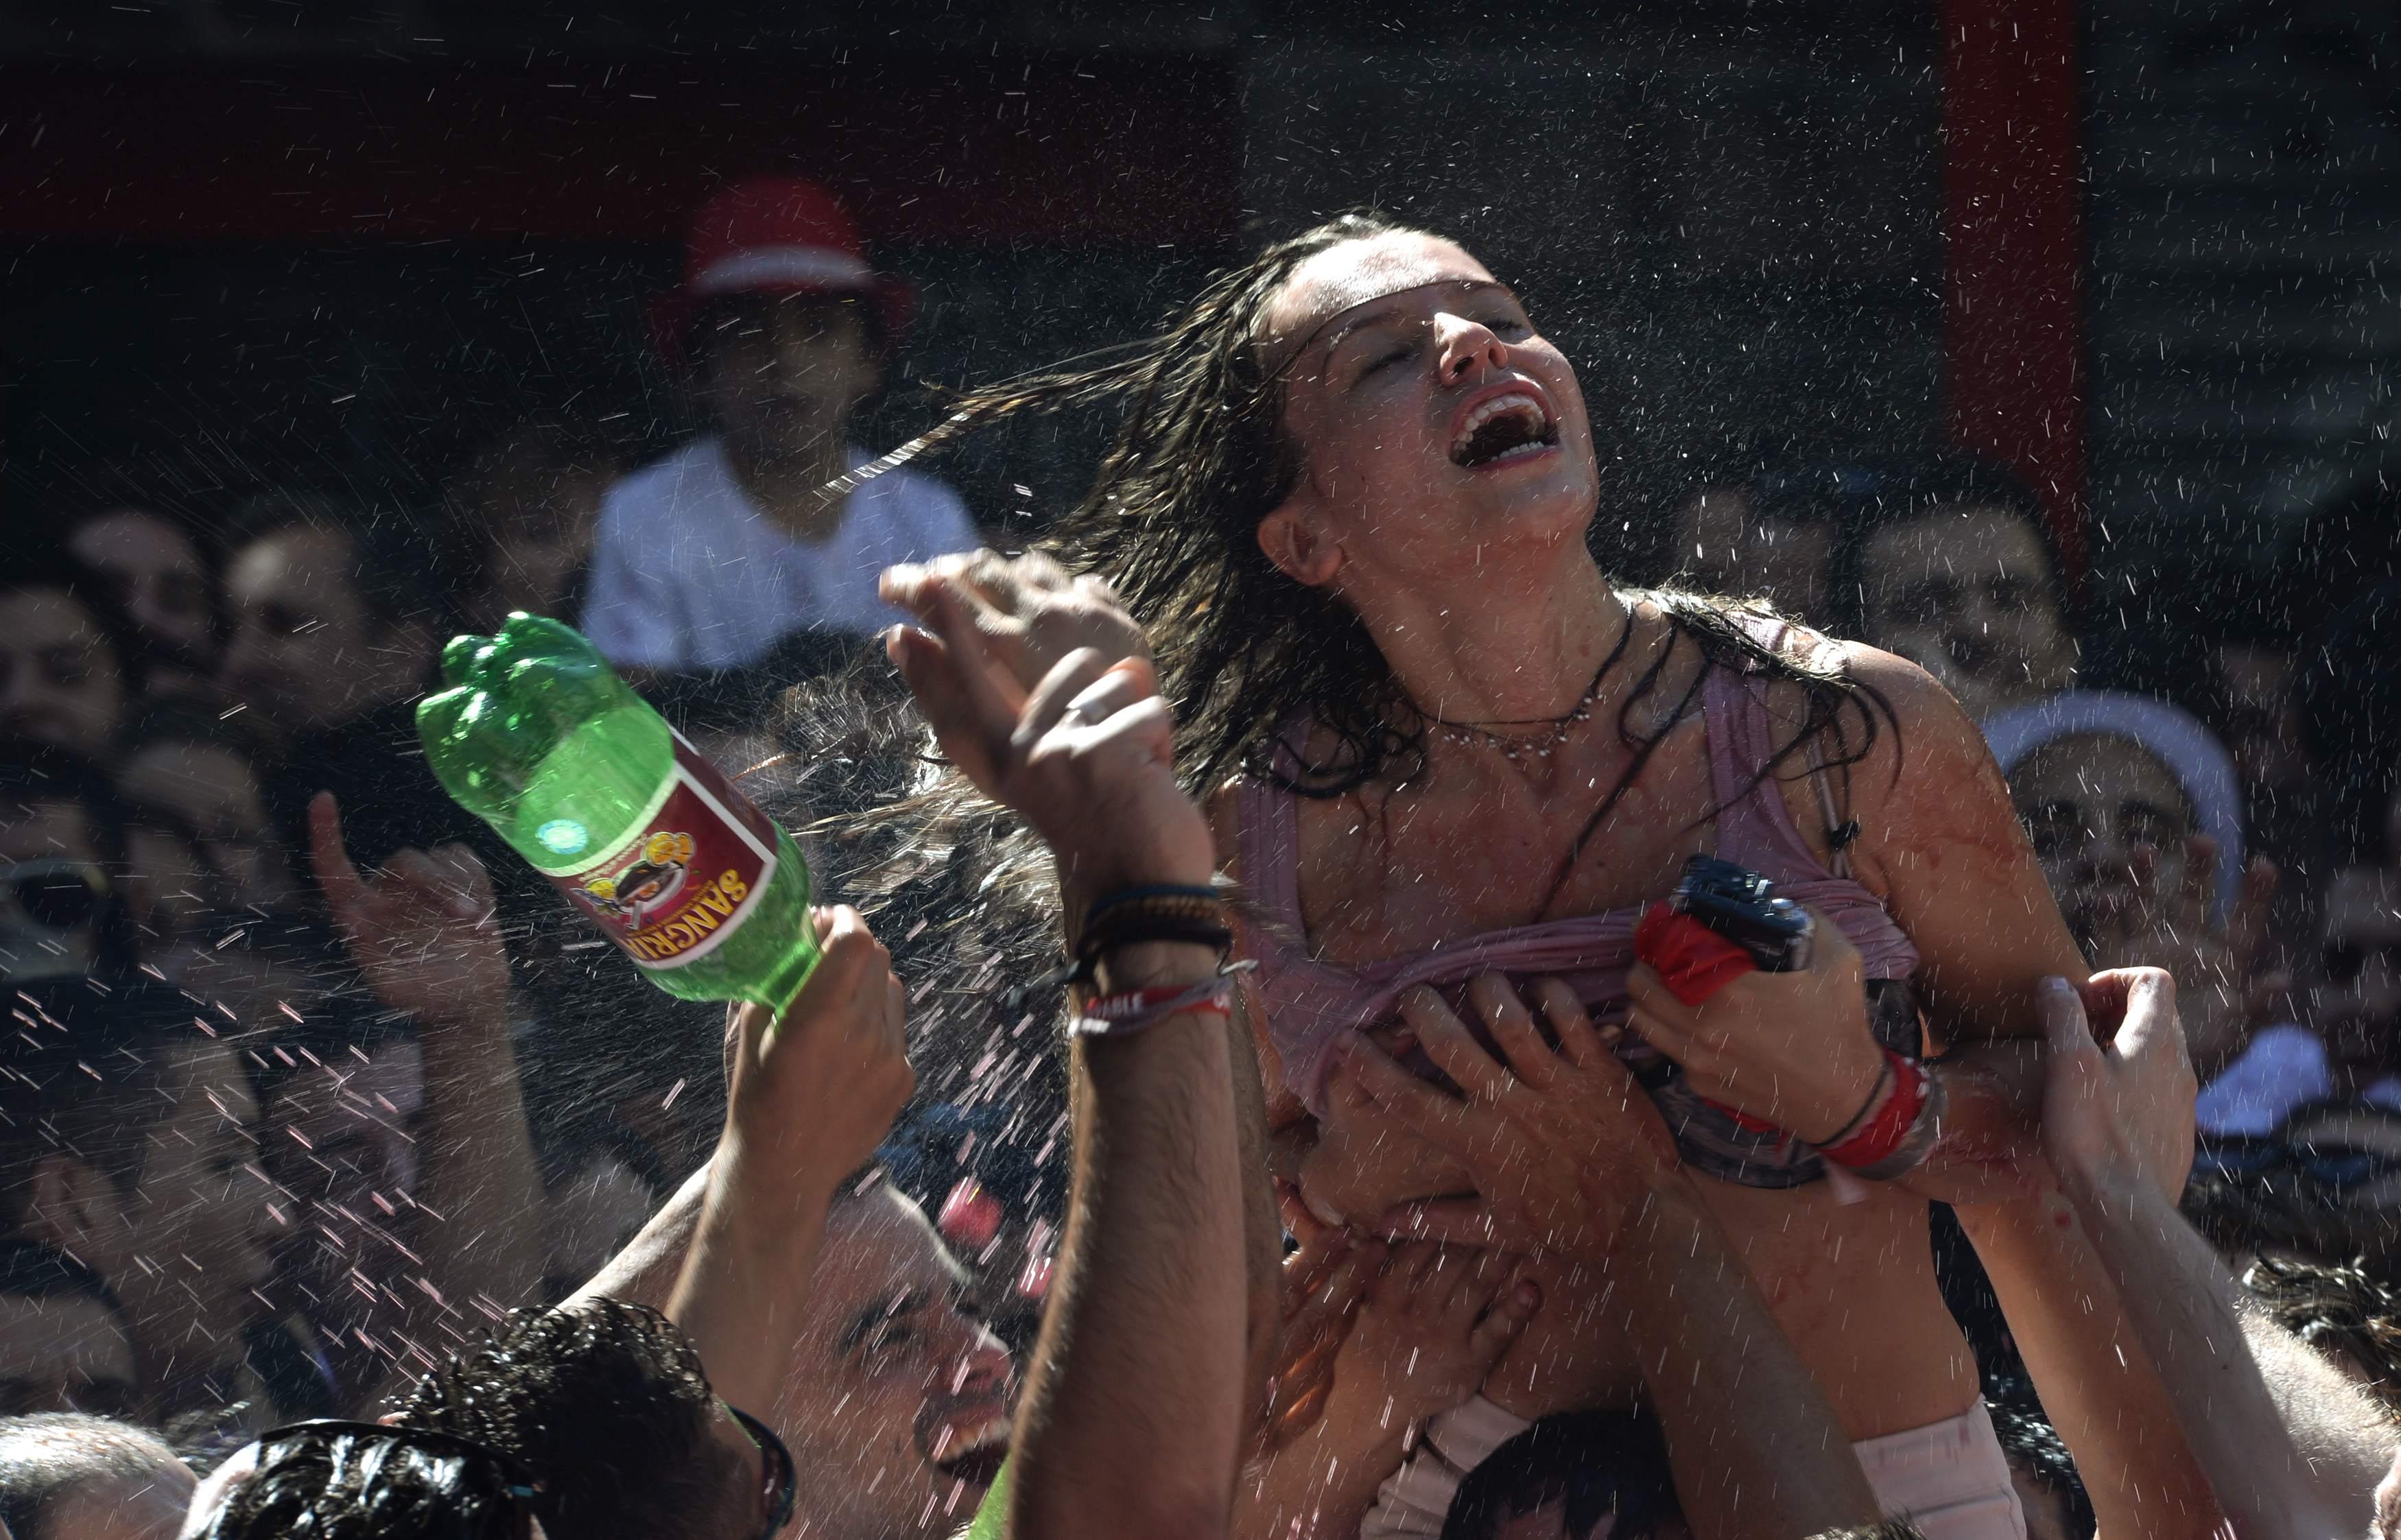 Revellers celebrate the start of the San Fermin festival in Pamplona